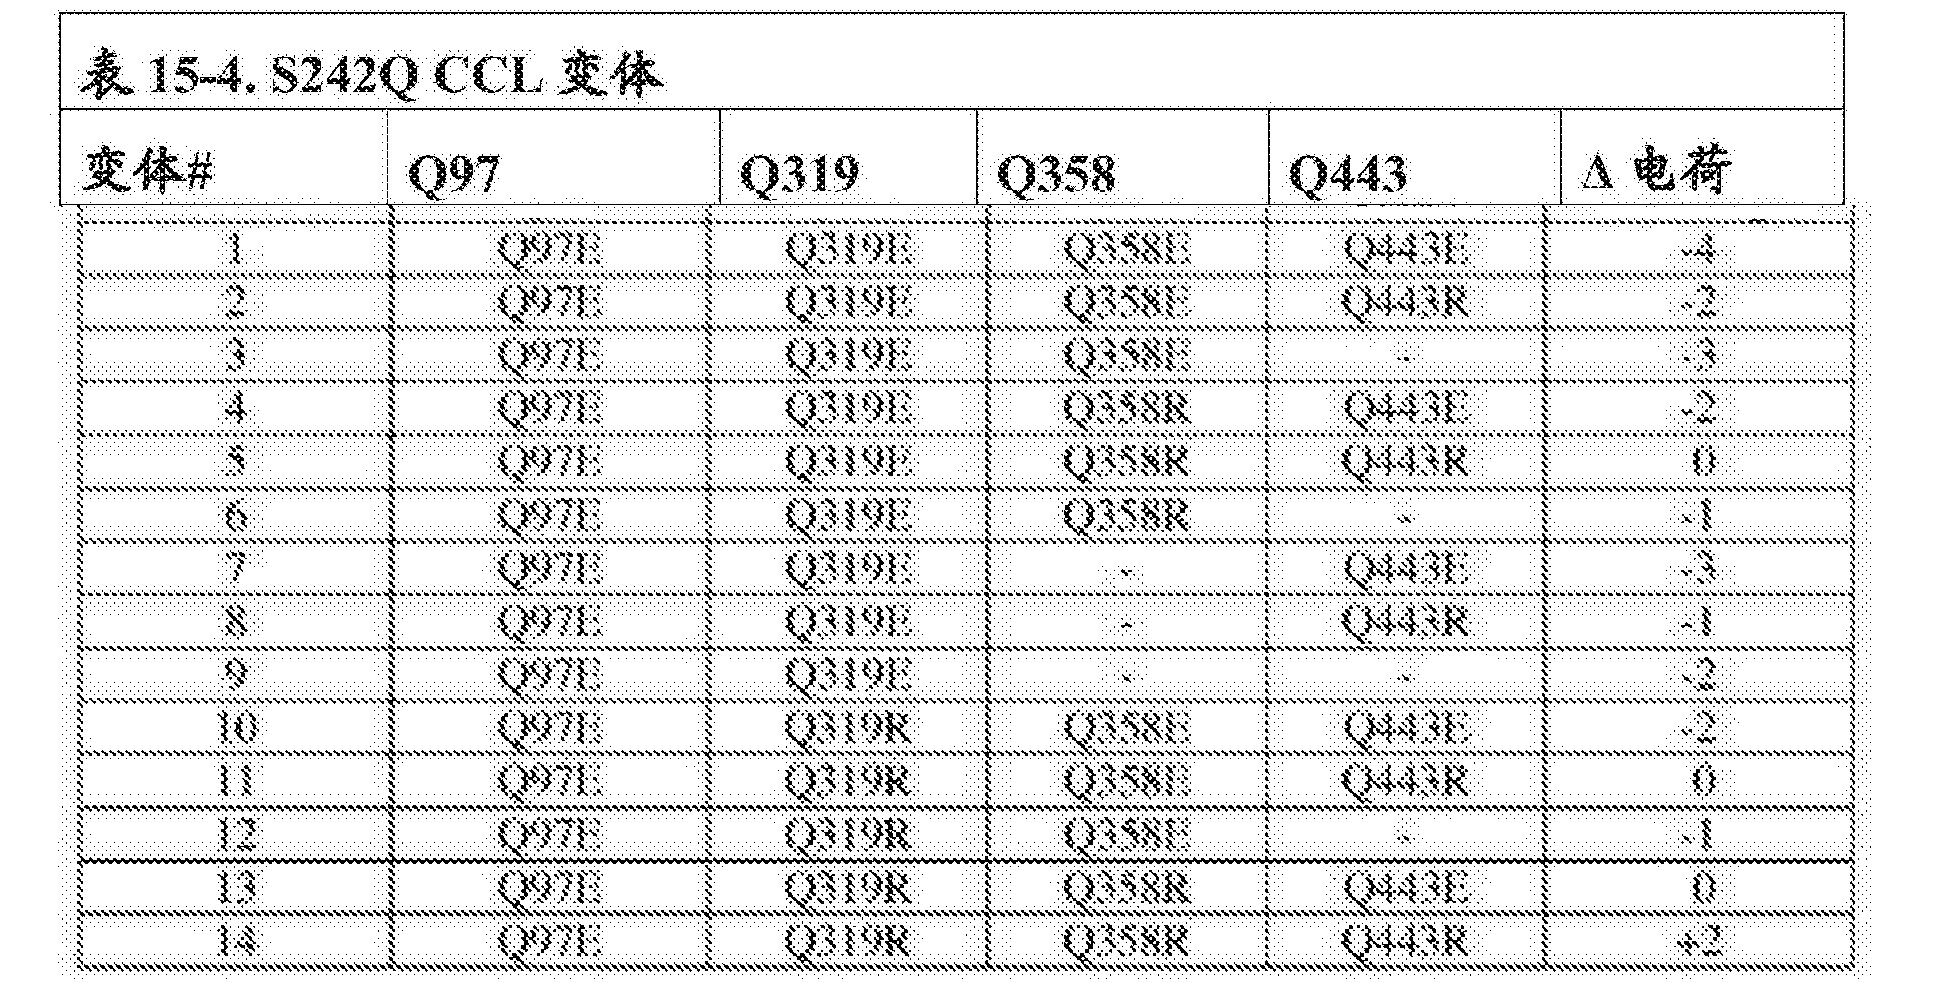 Figure CN105483099AD00662